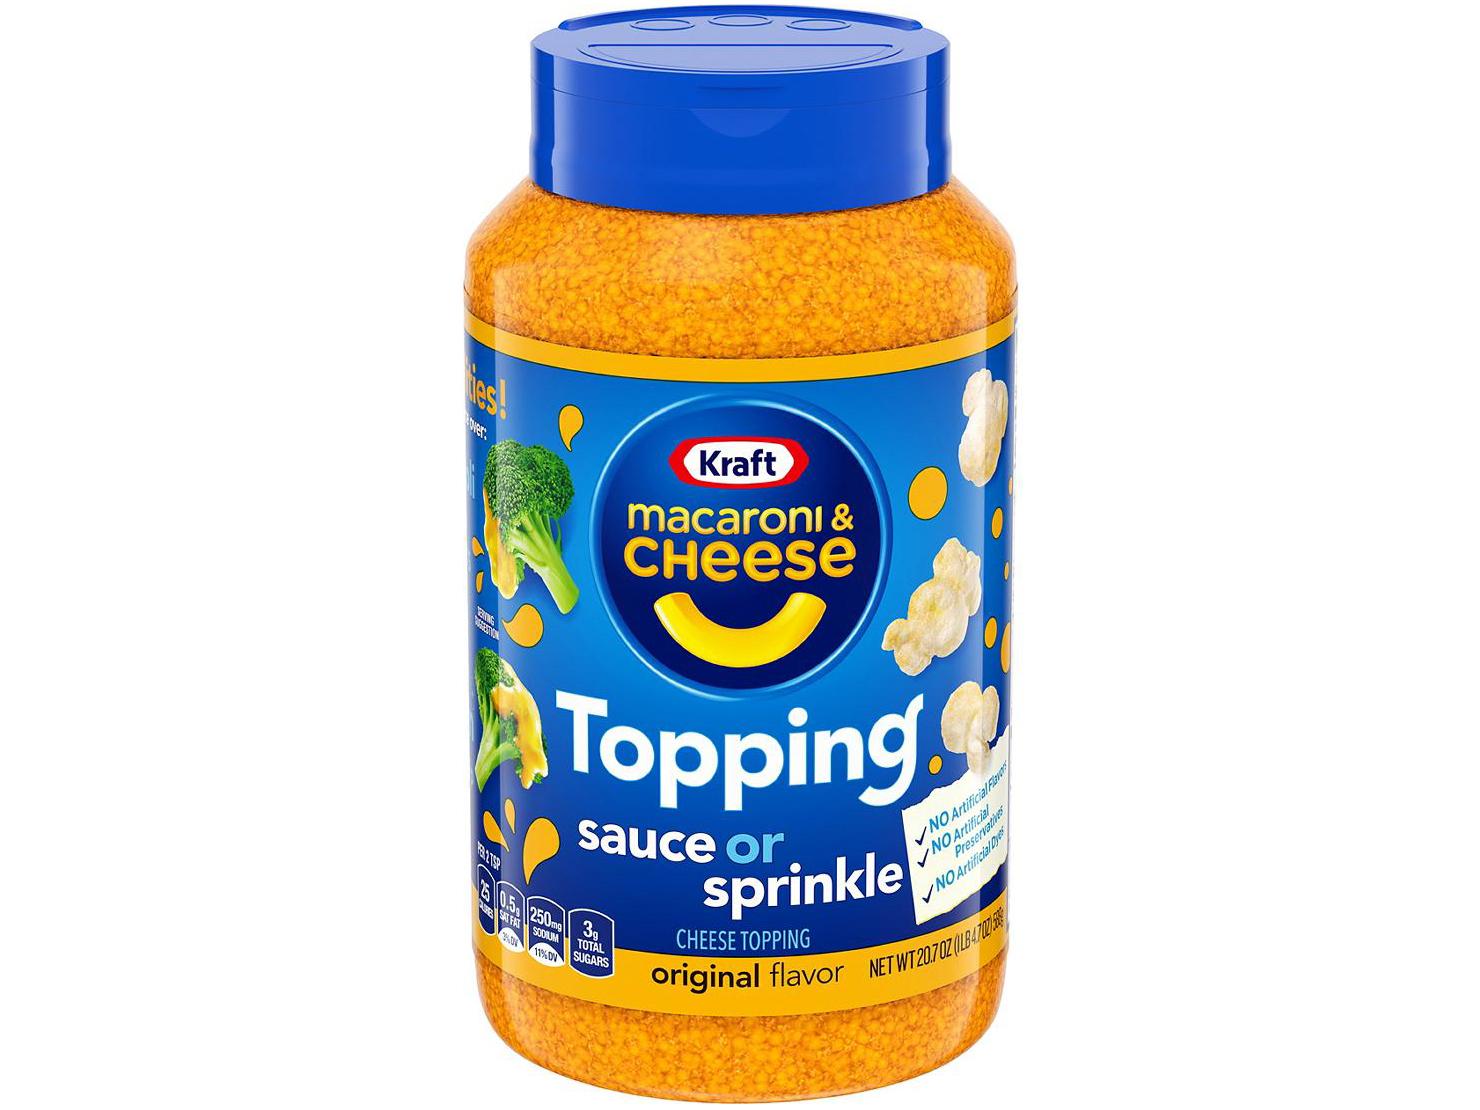 kraft-mac-cheese-topping.jpg